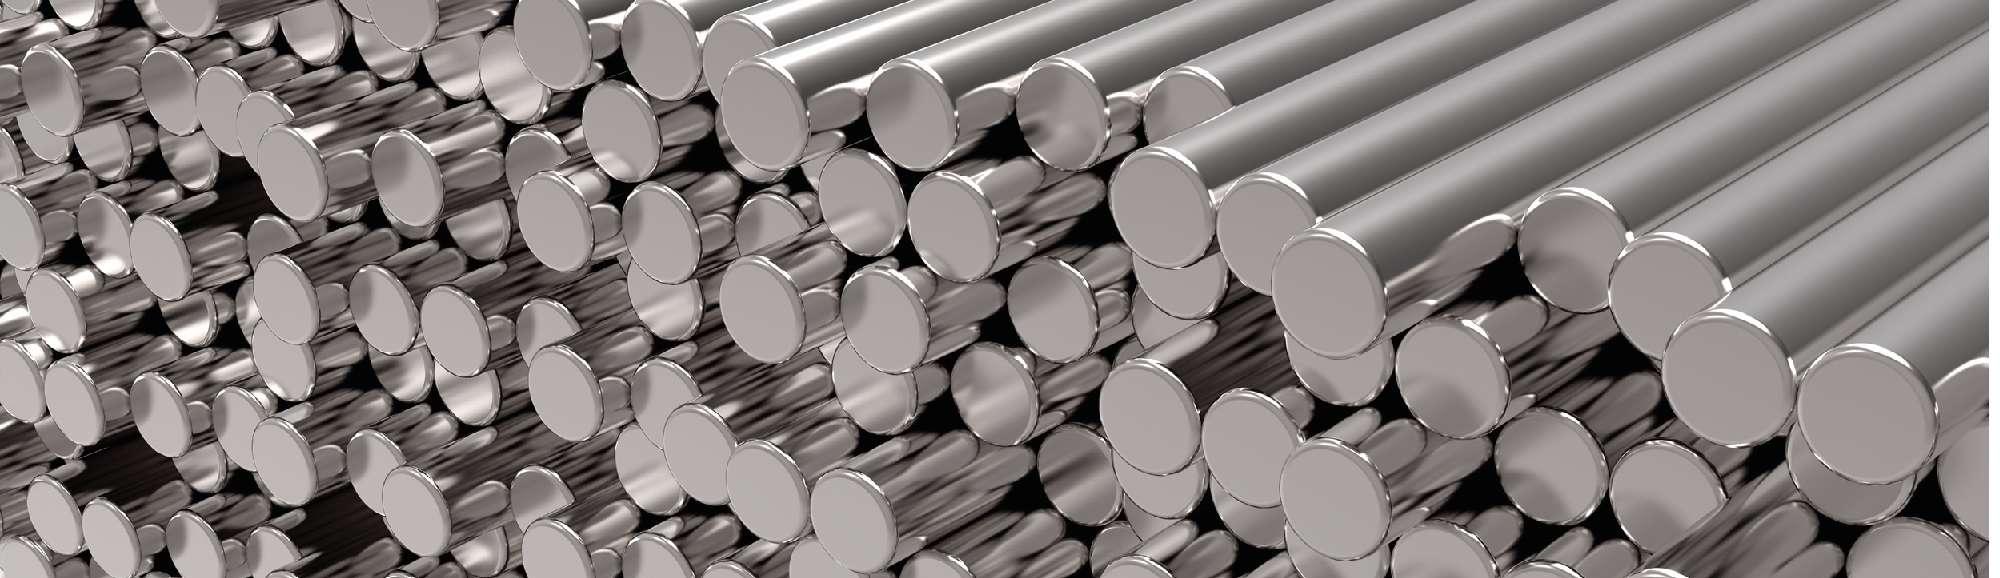 Carbon Steel 1010-1015-1018-1022-1038-1045-10B21